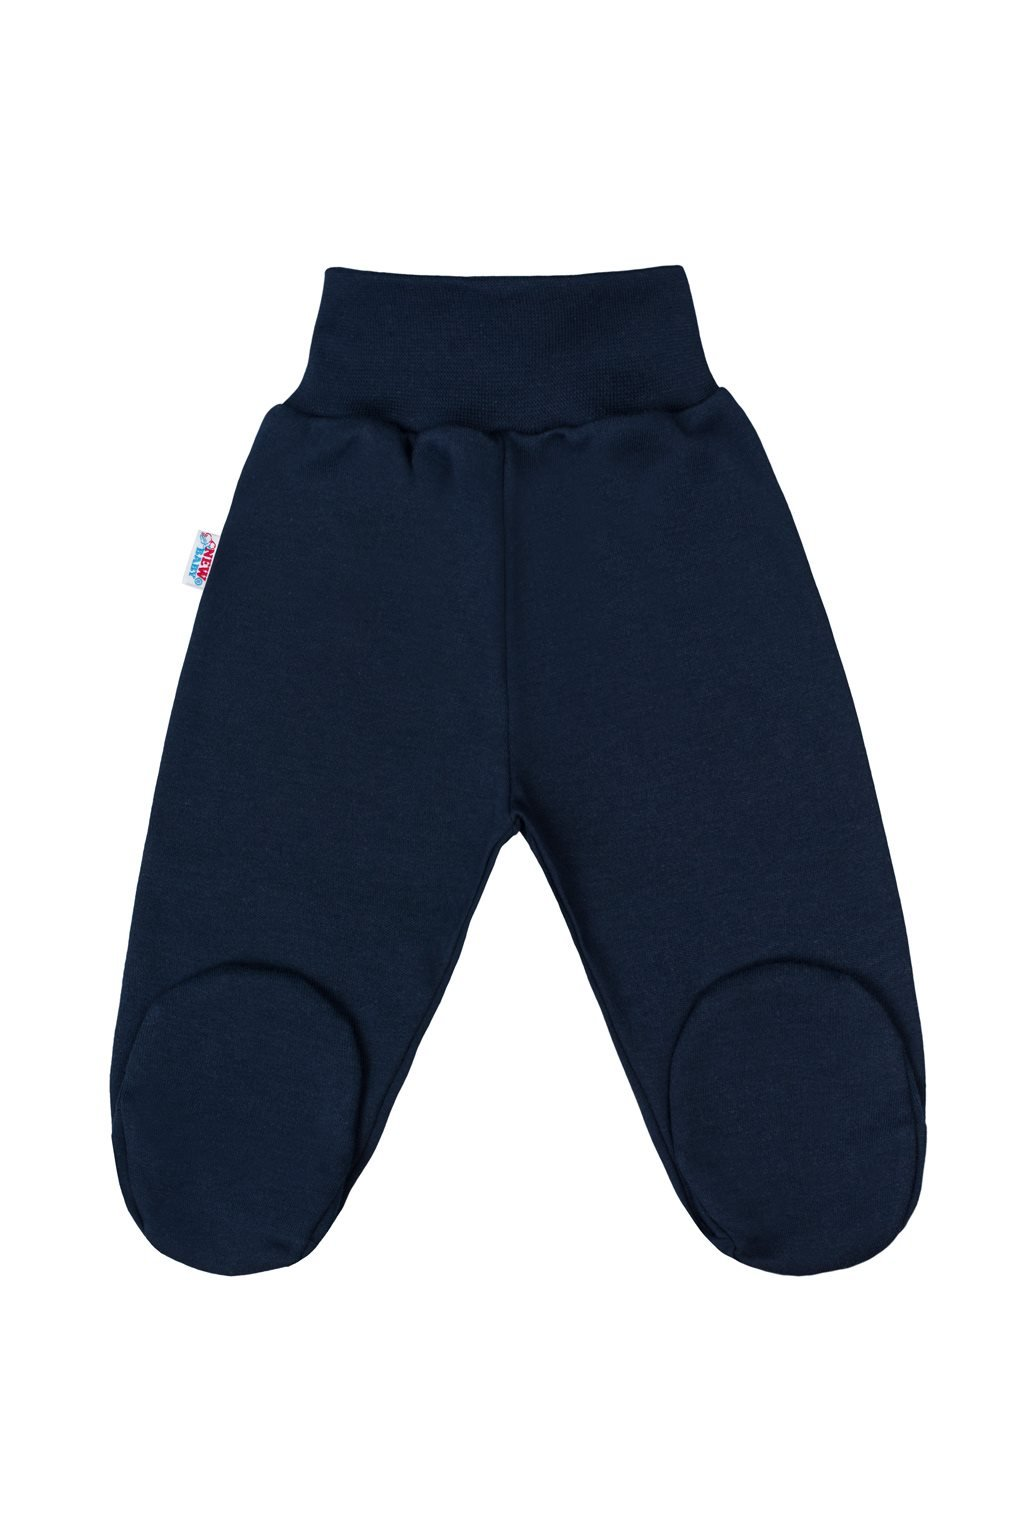 Dojčenské polodupačky New Baby Classic II tmavo modré